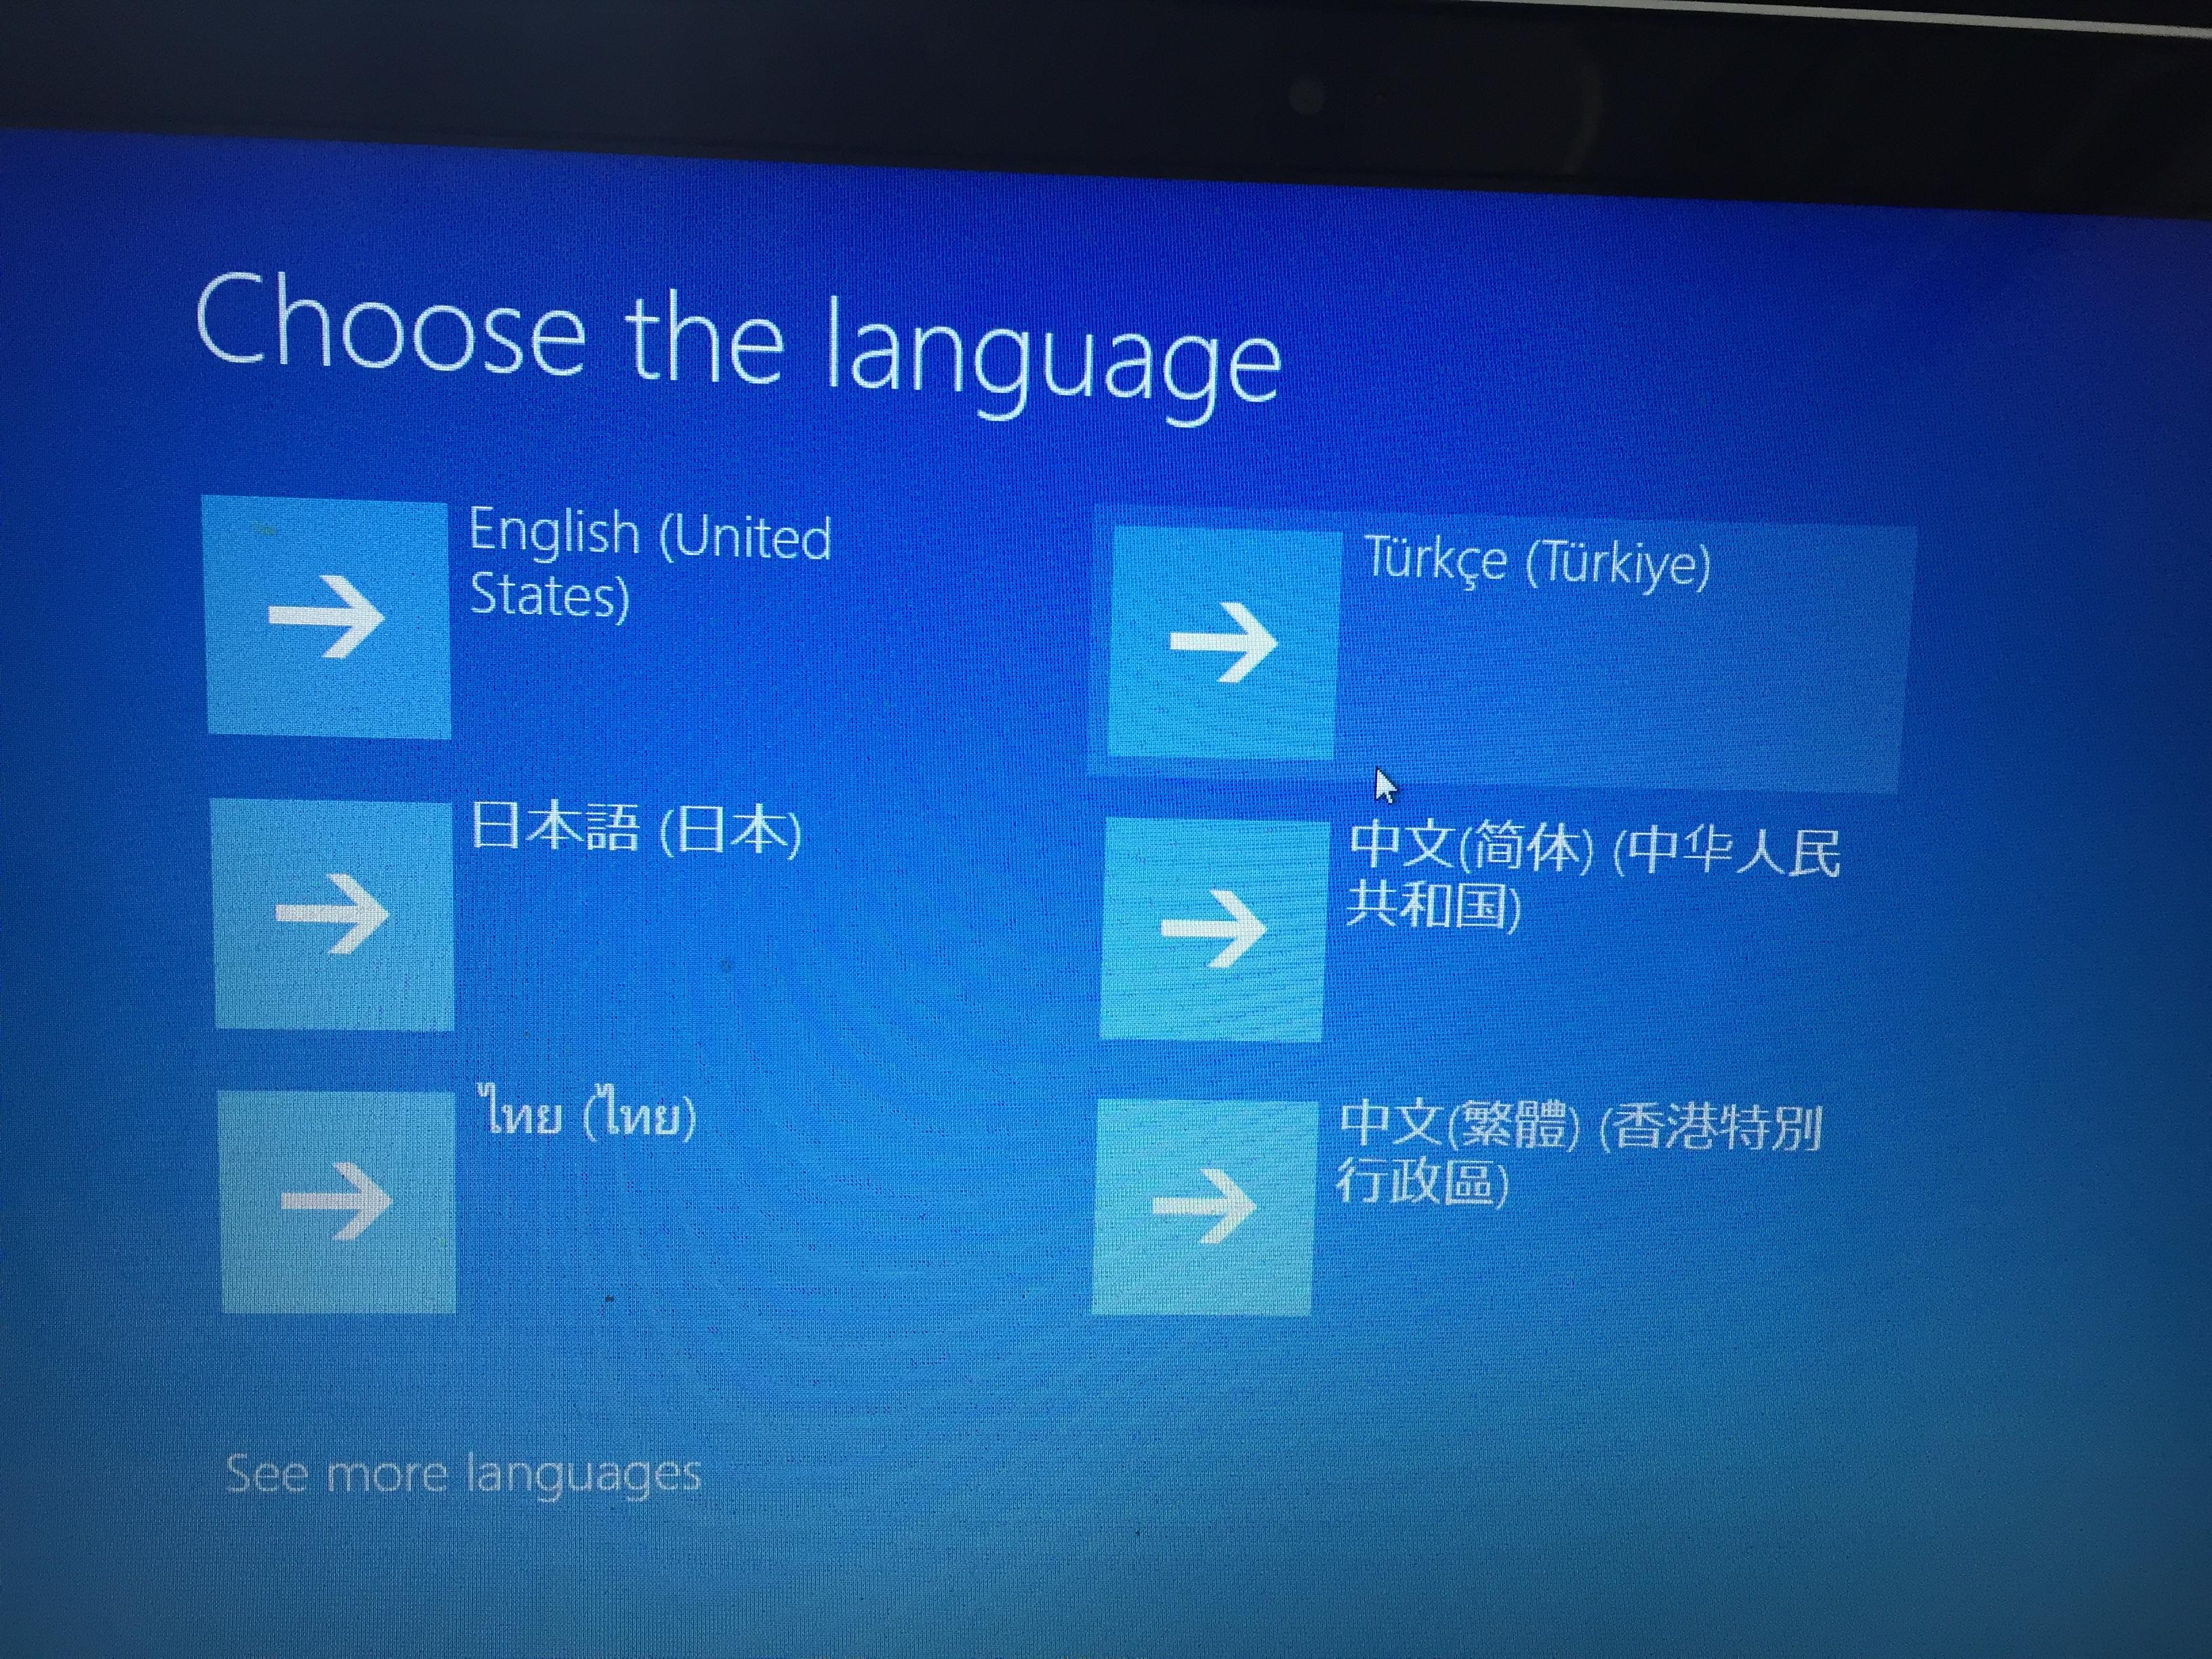 3-Sony-Vaio-Svf152c29w-notebook-recovery-tusu.jpg